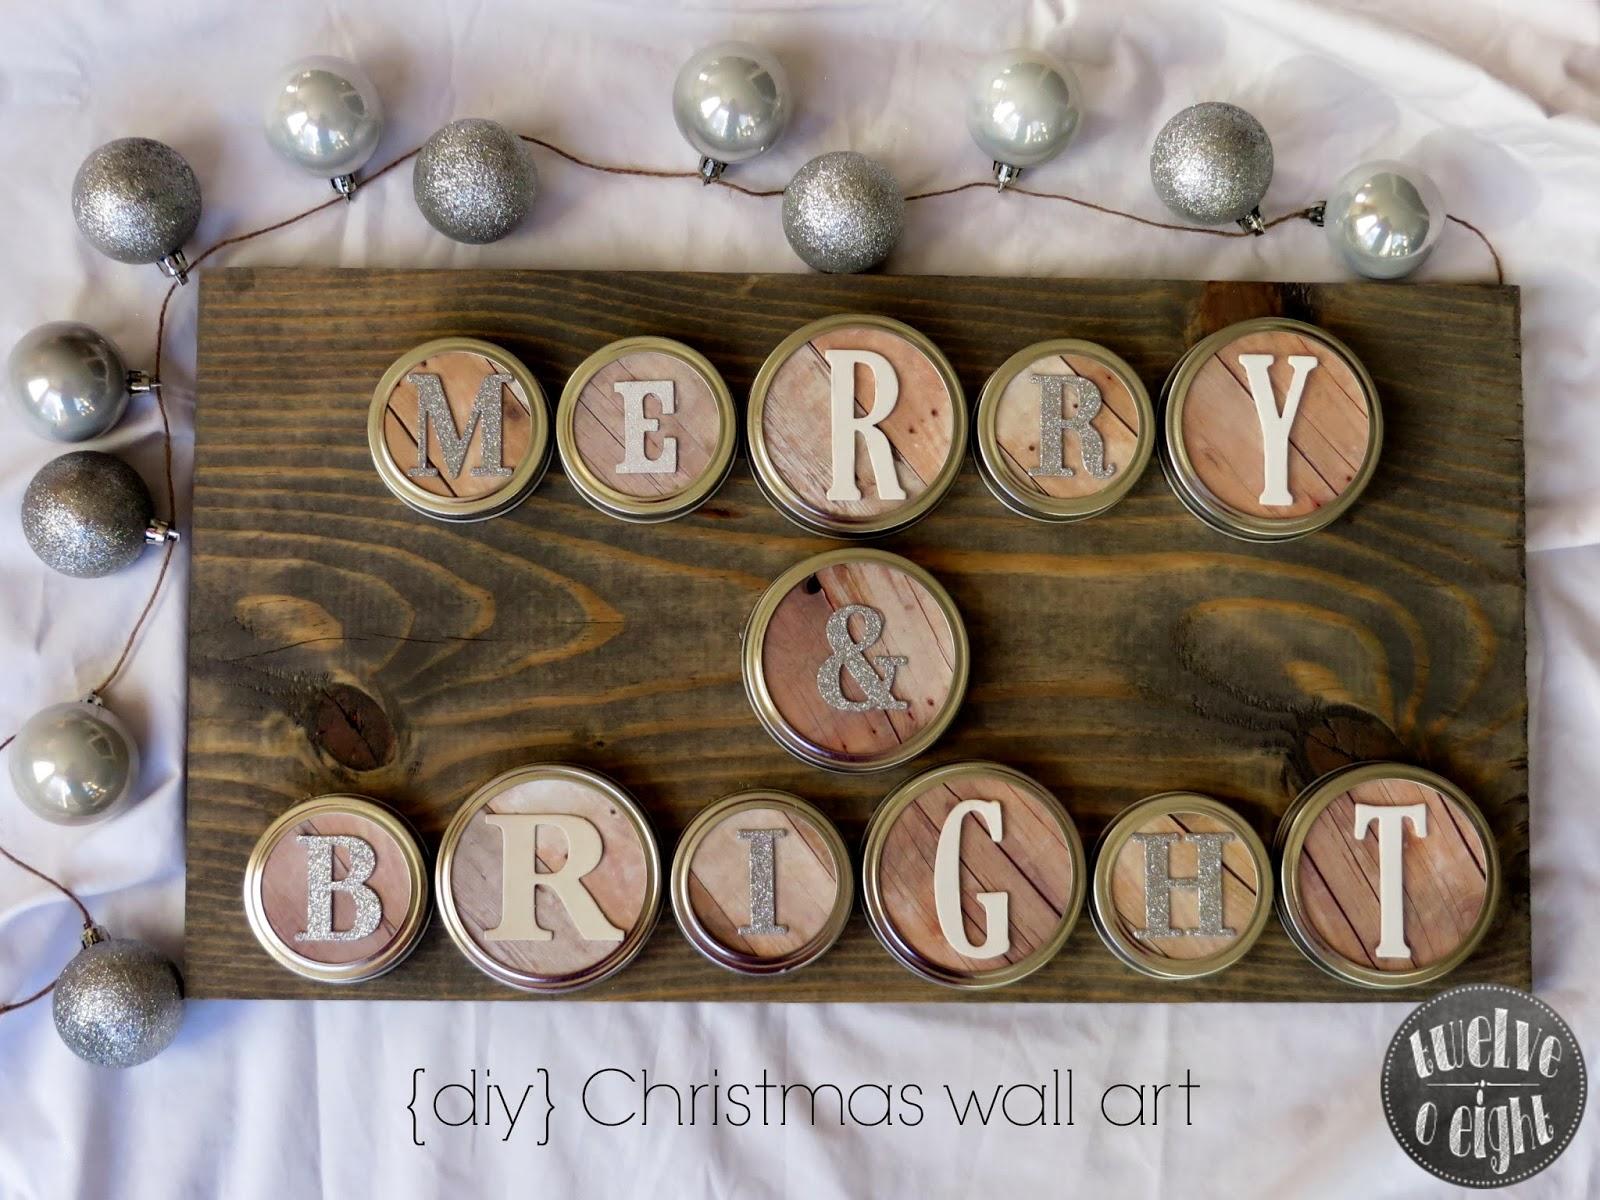 Merry + Bright Rustic Christmas Wall Art